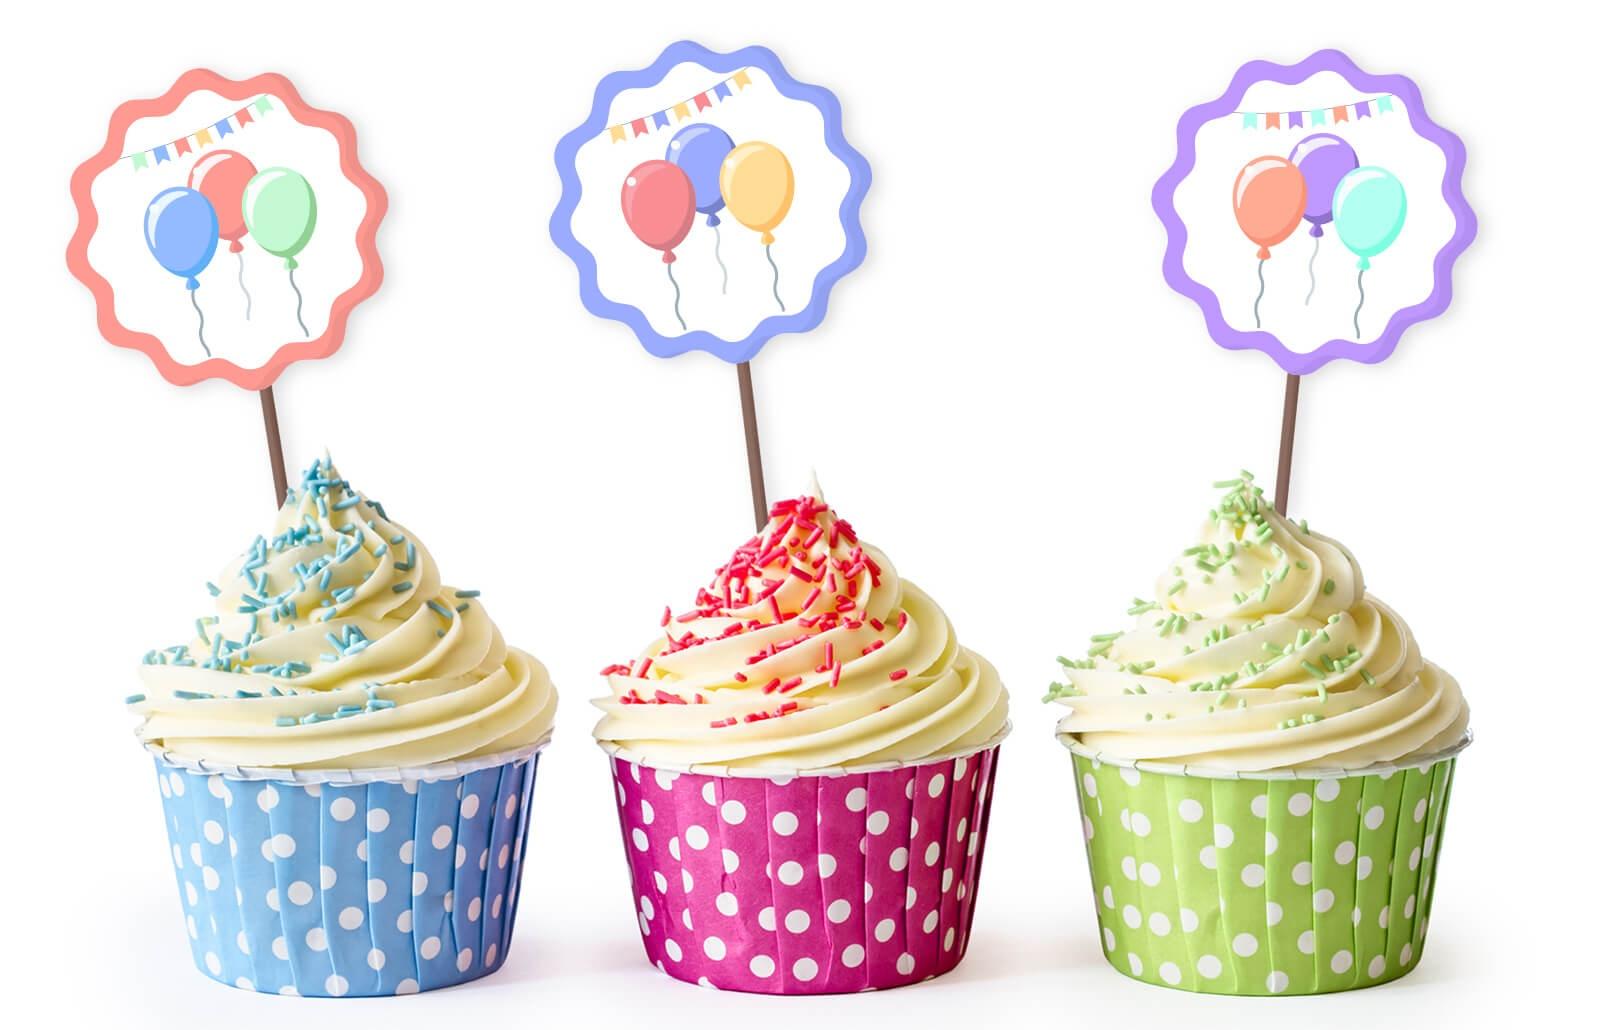 Free Printable Cupcake Toppers   Lovetoknow - Free Printable Cupcake Toppers